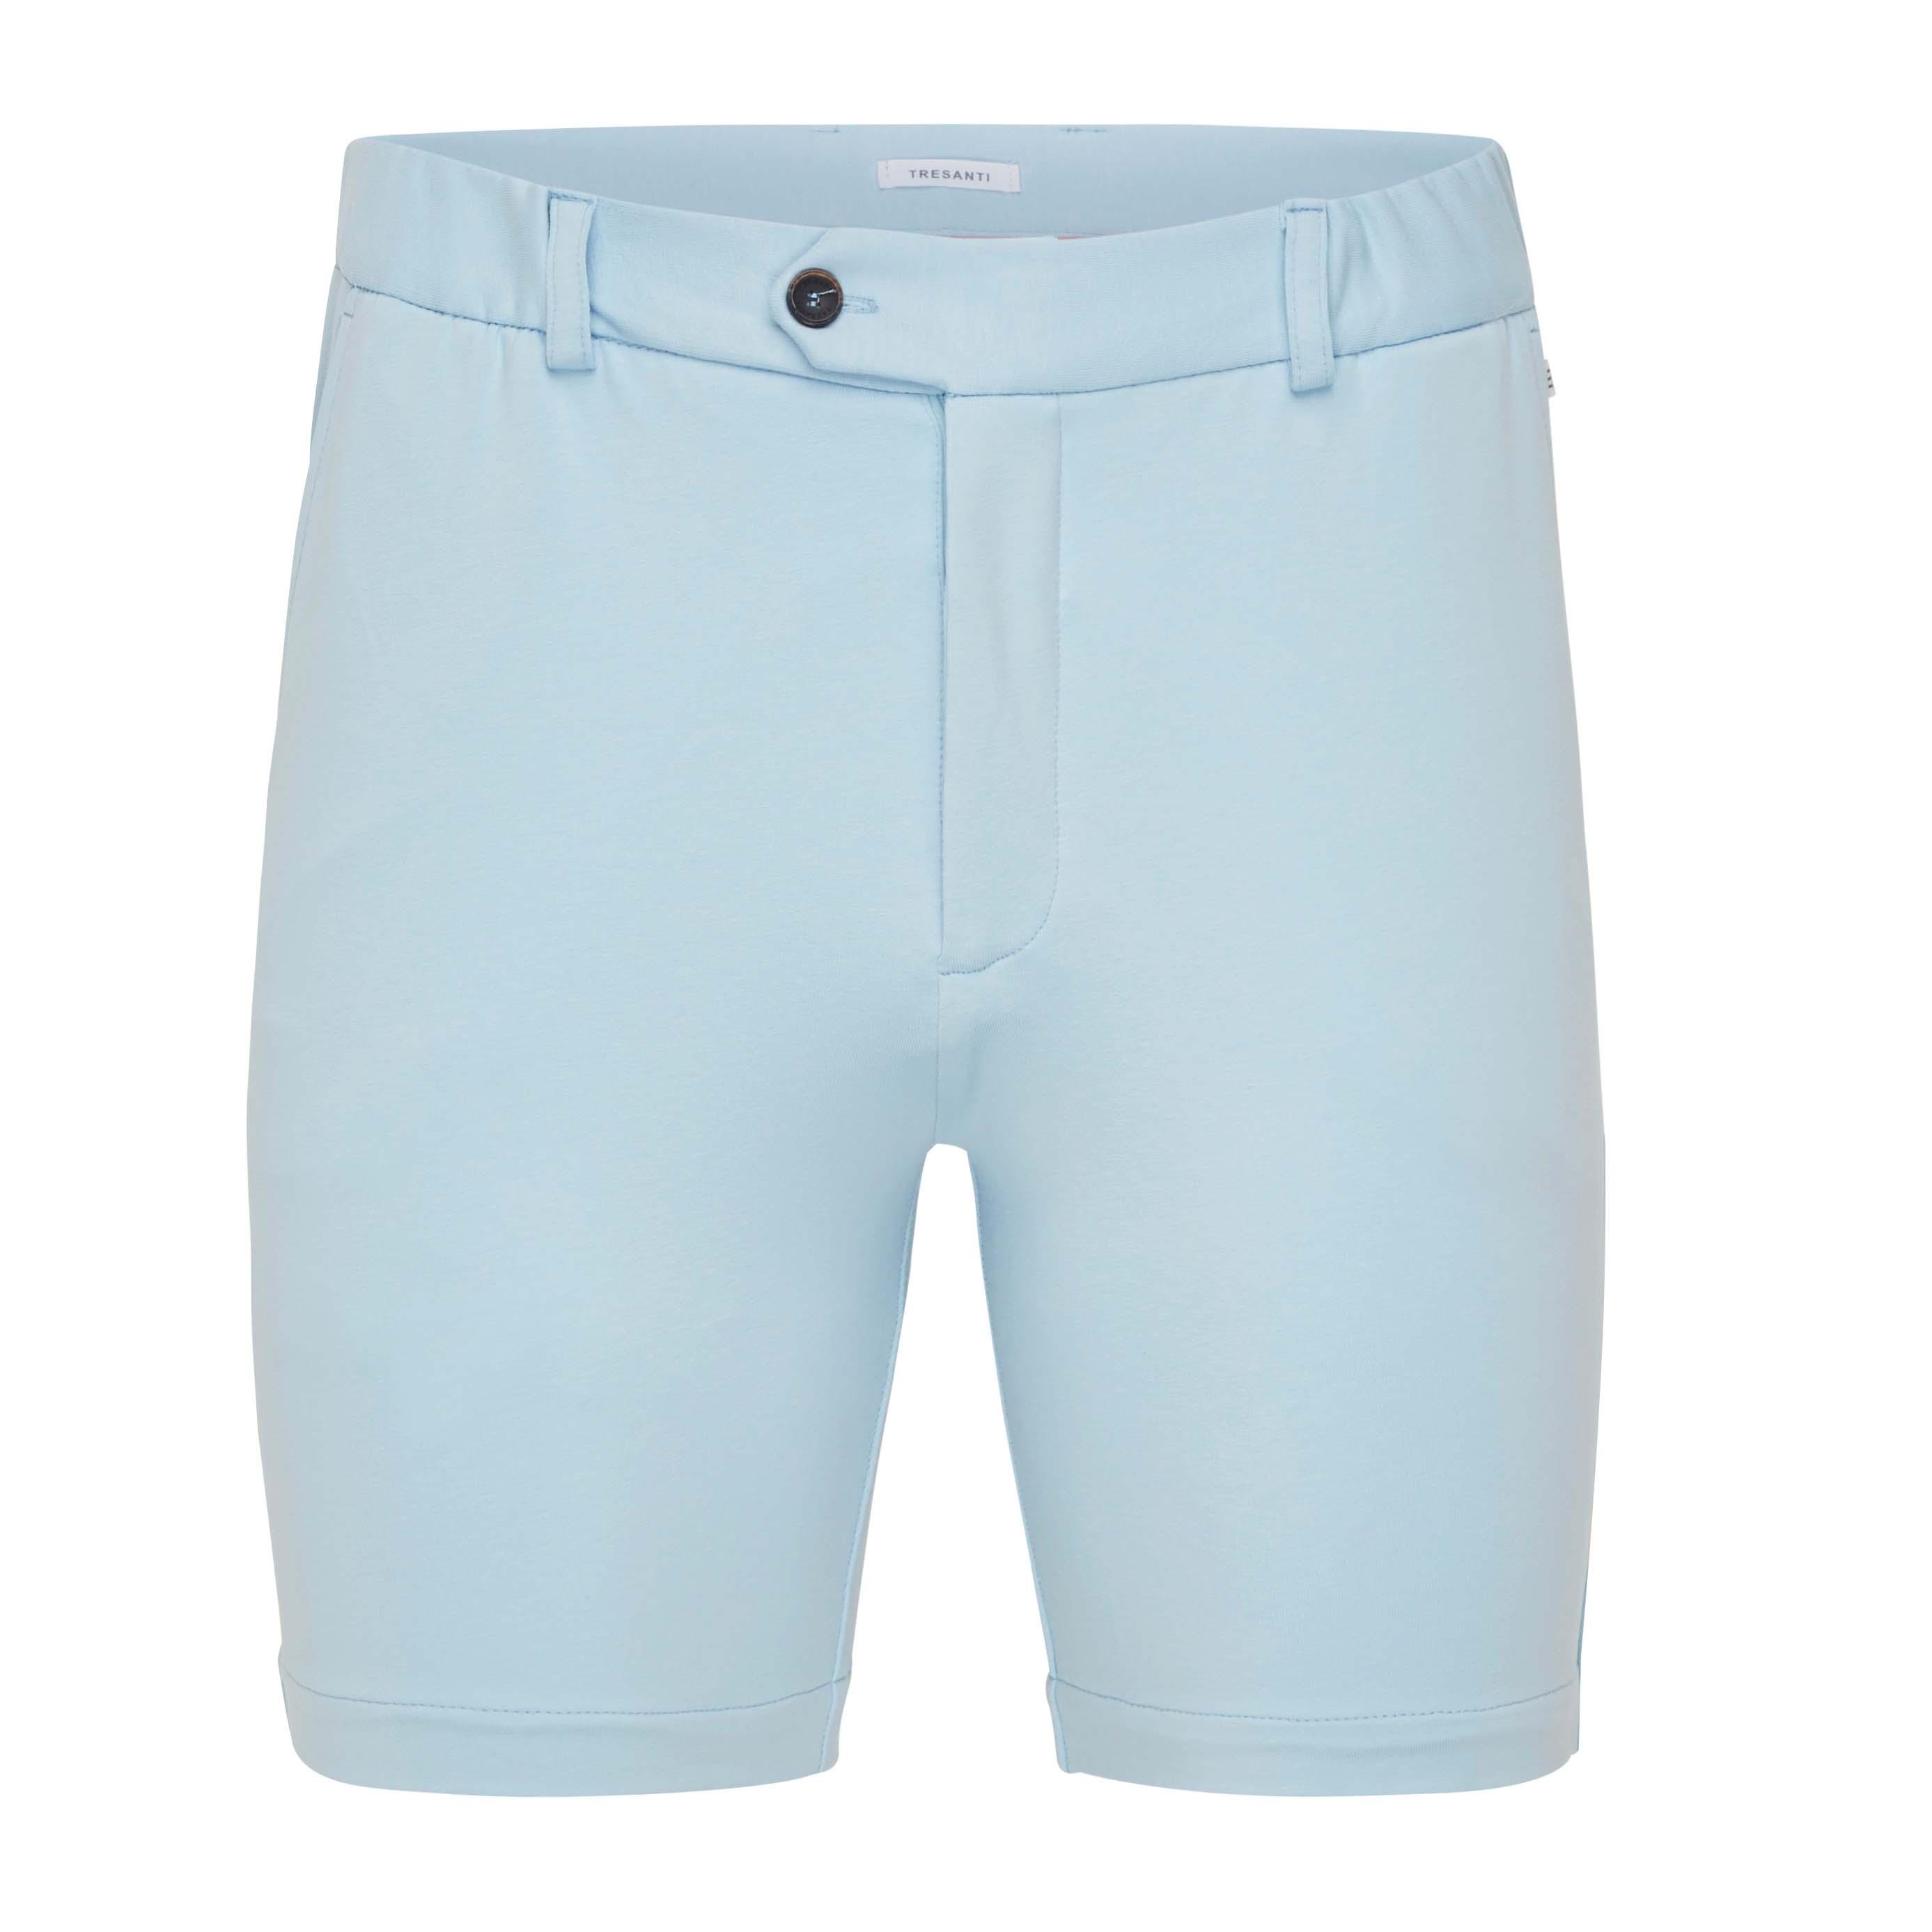 Trey | Shorts stretch light blue